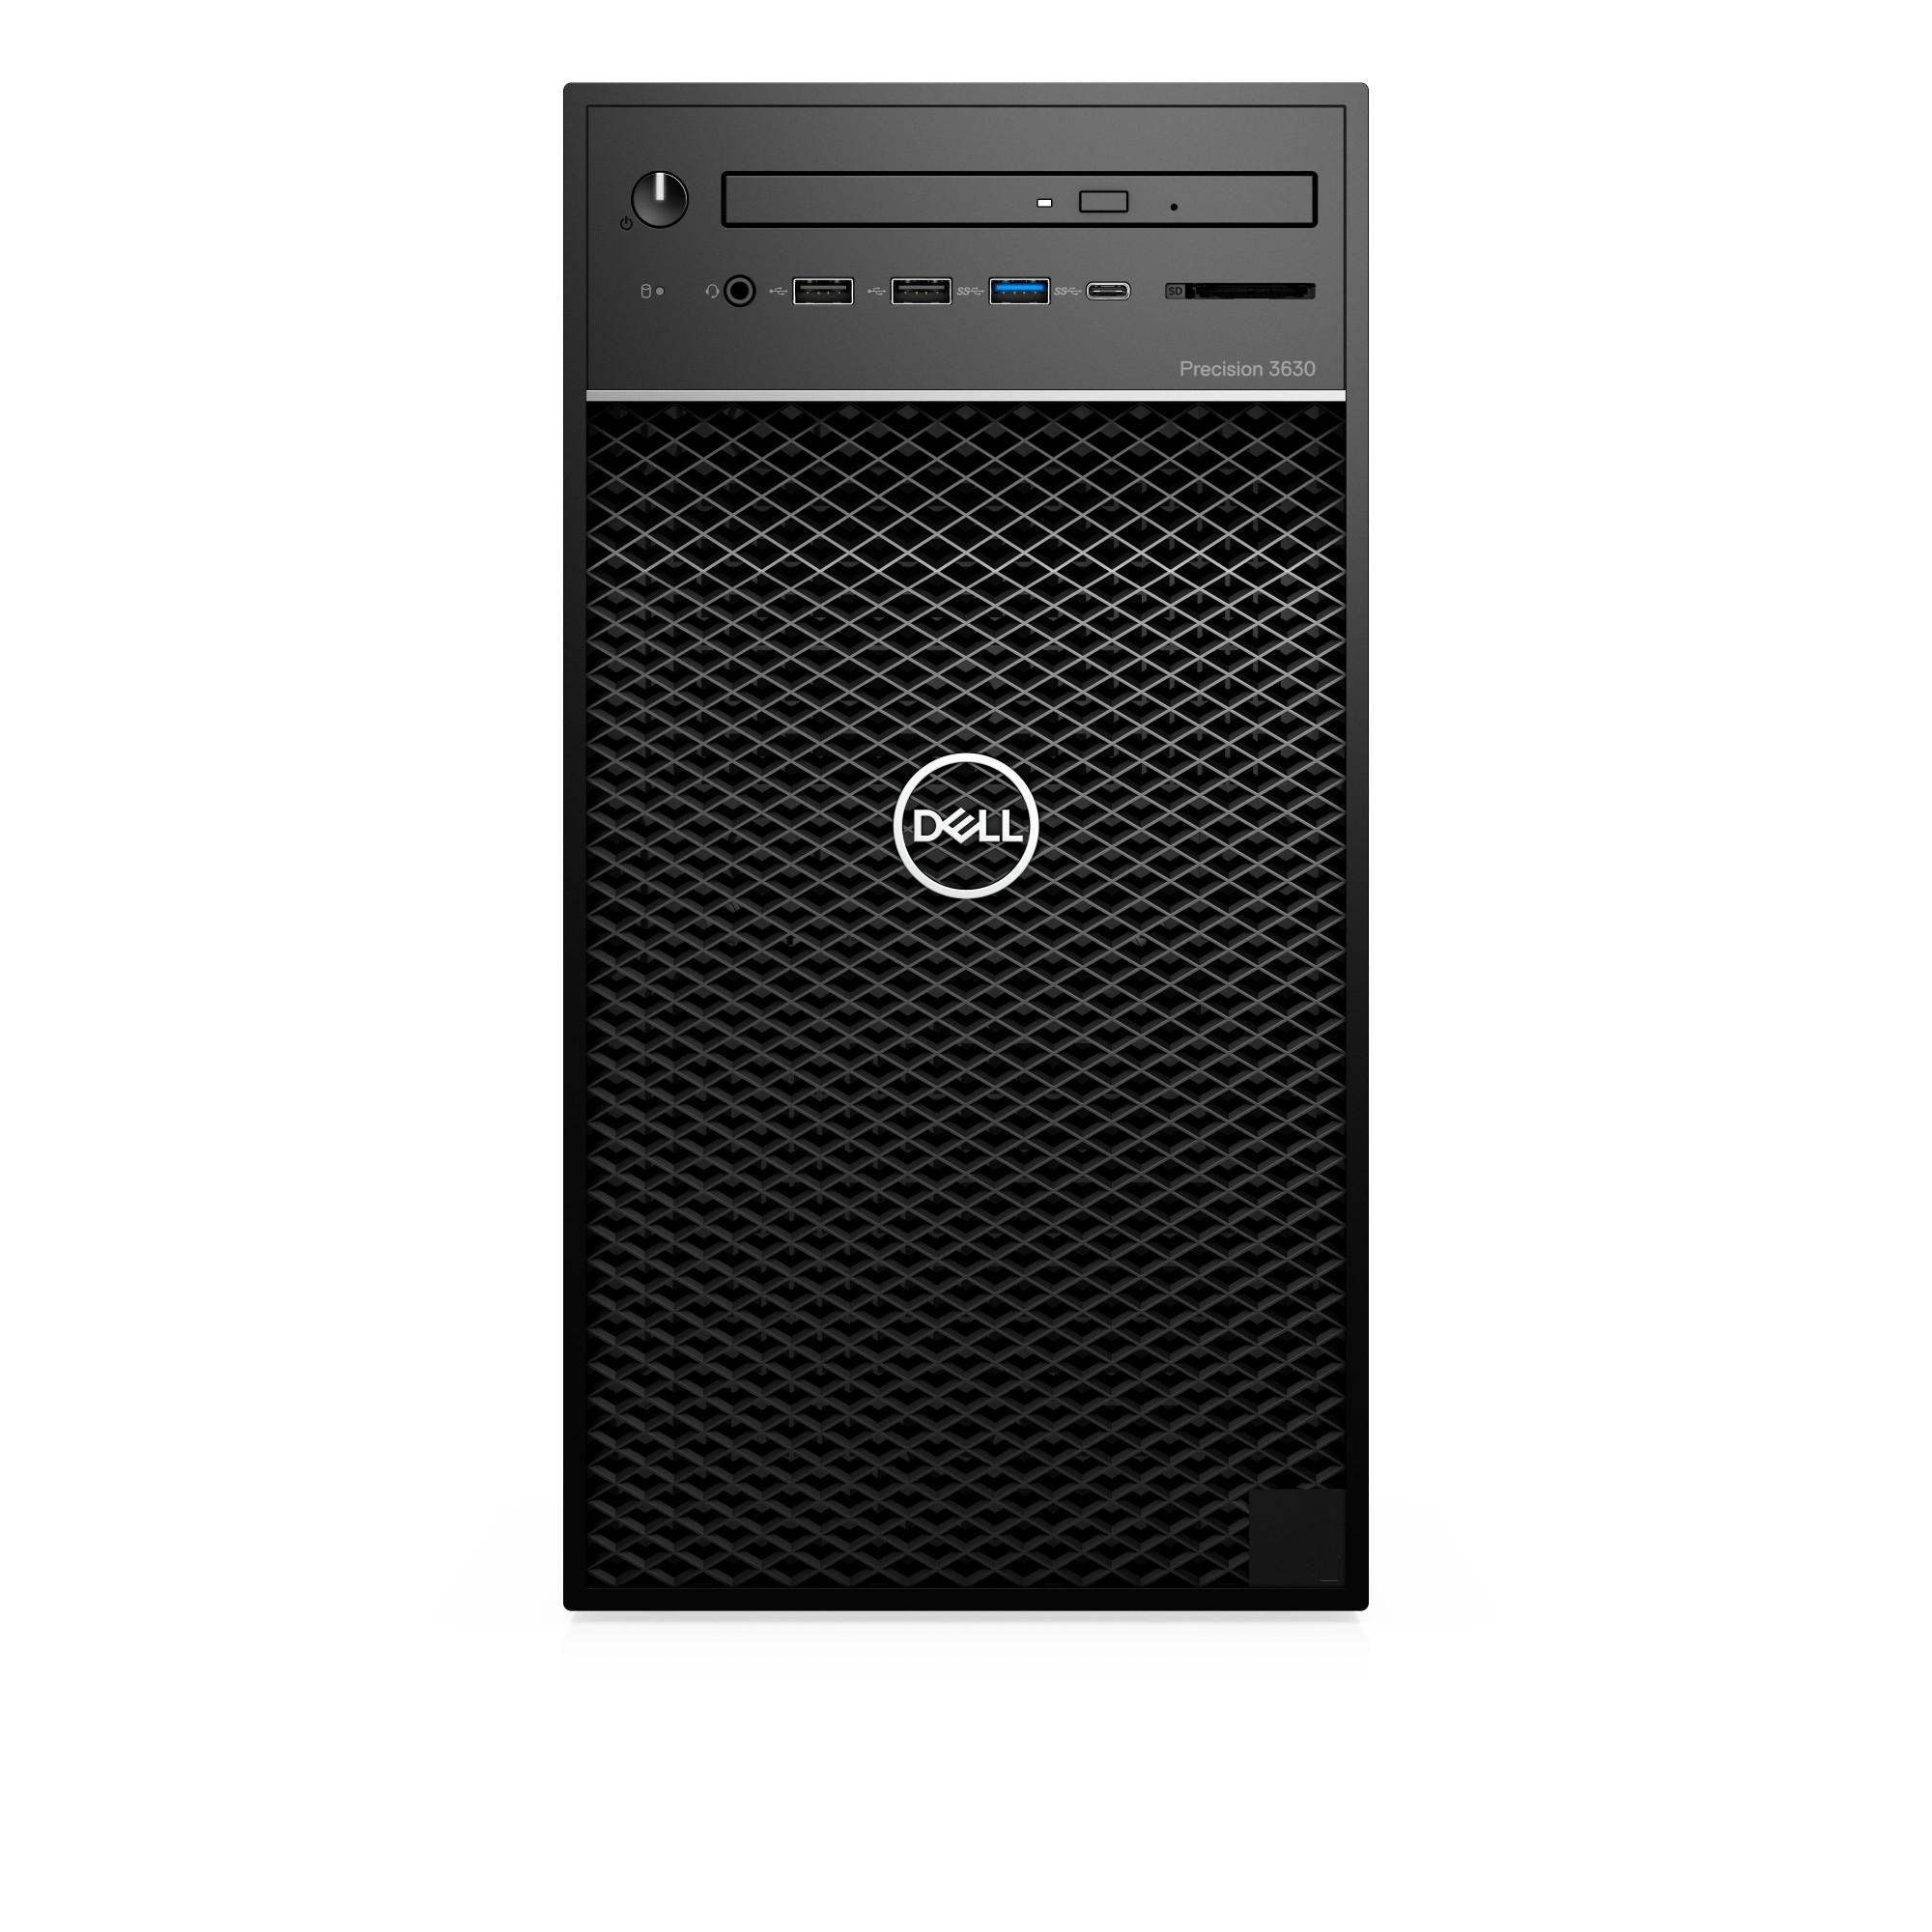 DELL Precision T3630 8th gen Intel® Core™ i7 i7-8700 8 GB DDR4-SDRAM 256 GB SSD Black Tower Workstation